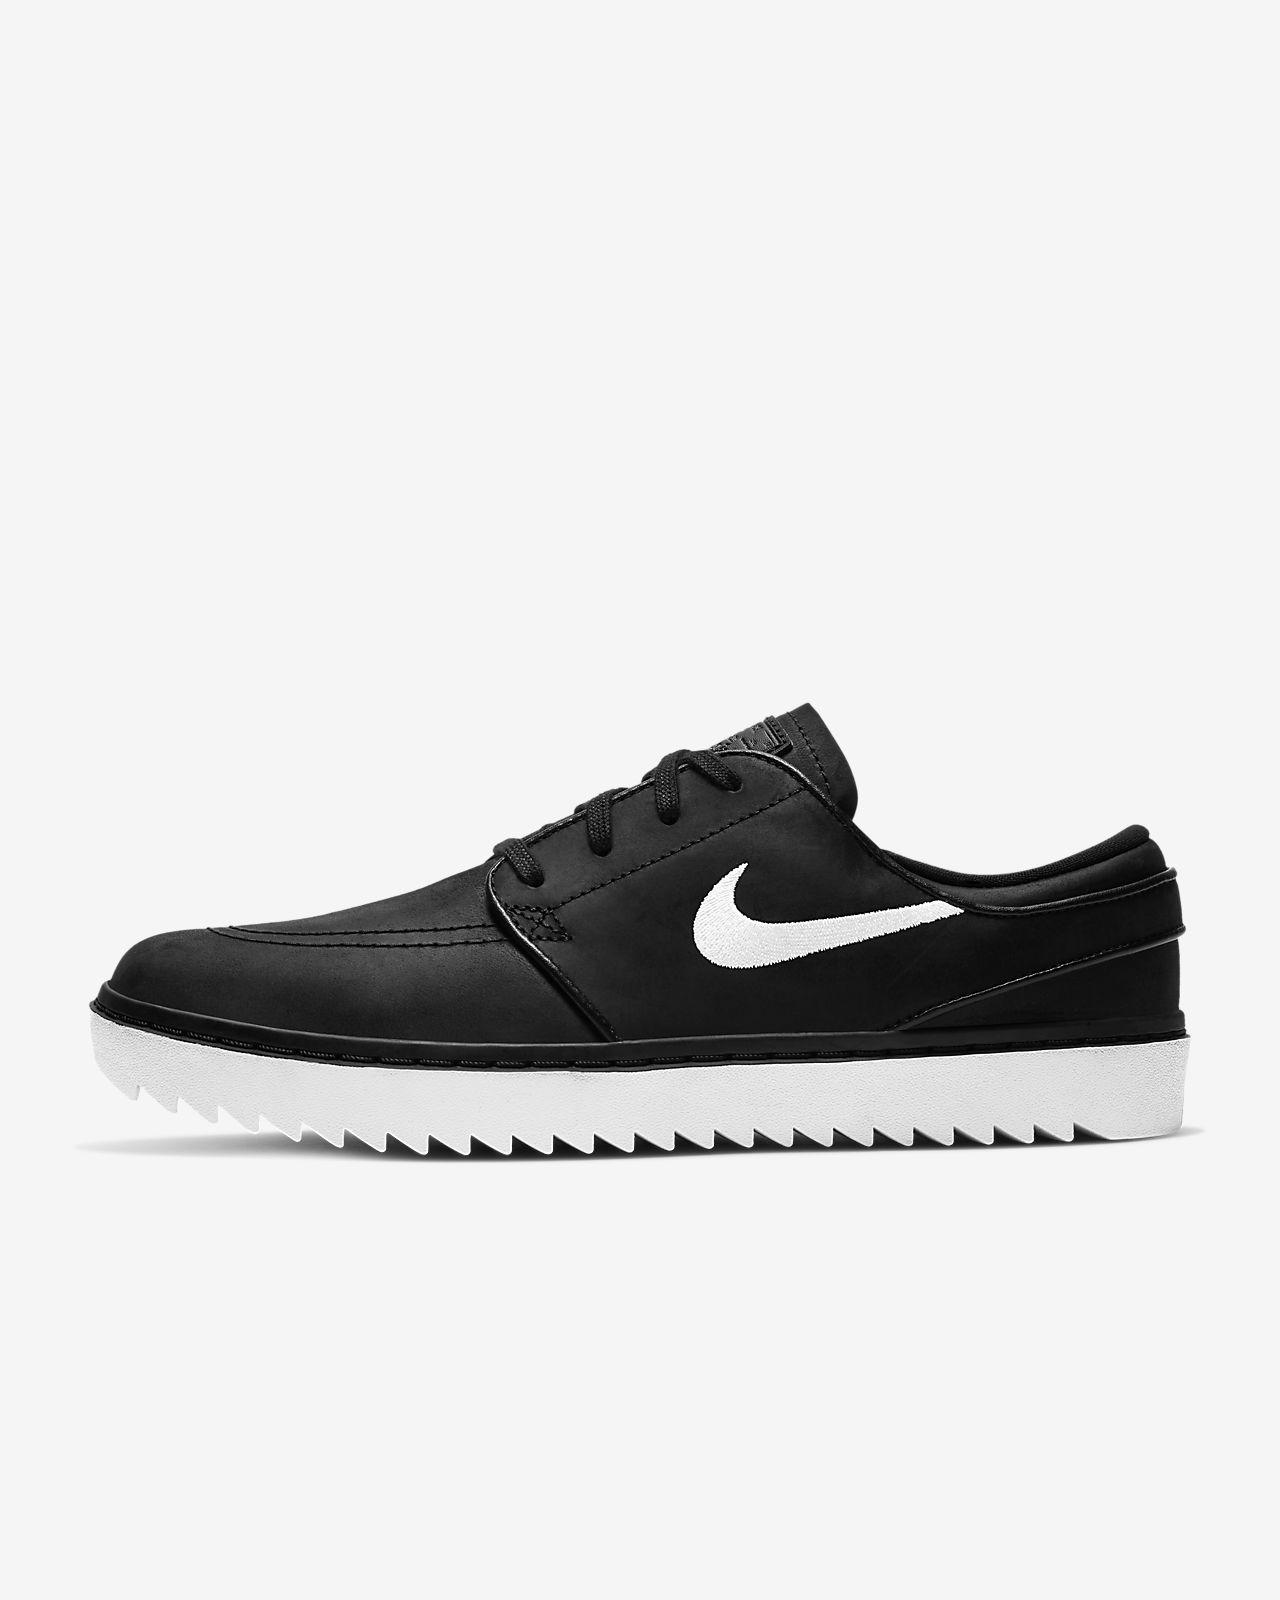 Nike Janoski G Men's Golf Shoe. Nike HU